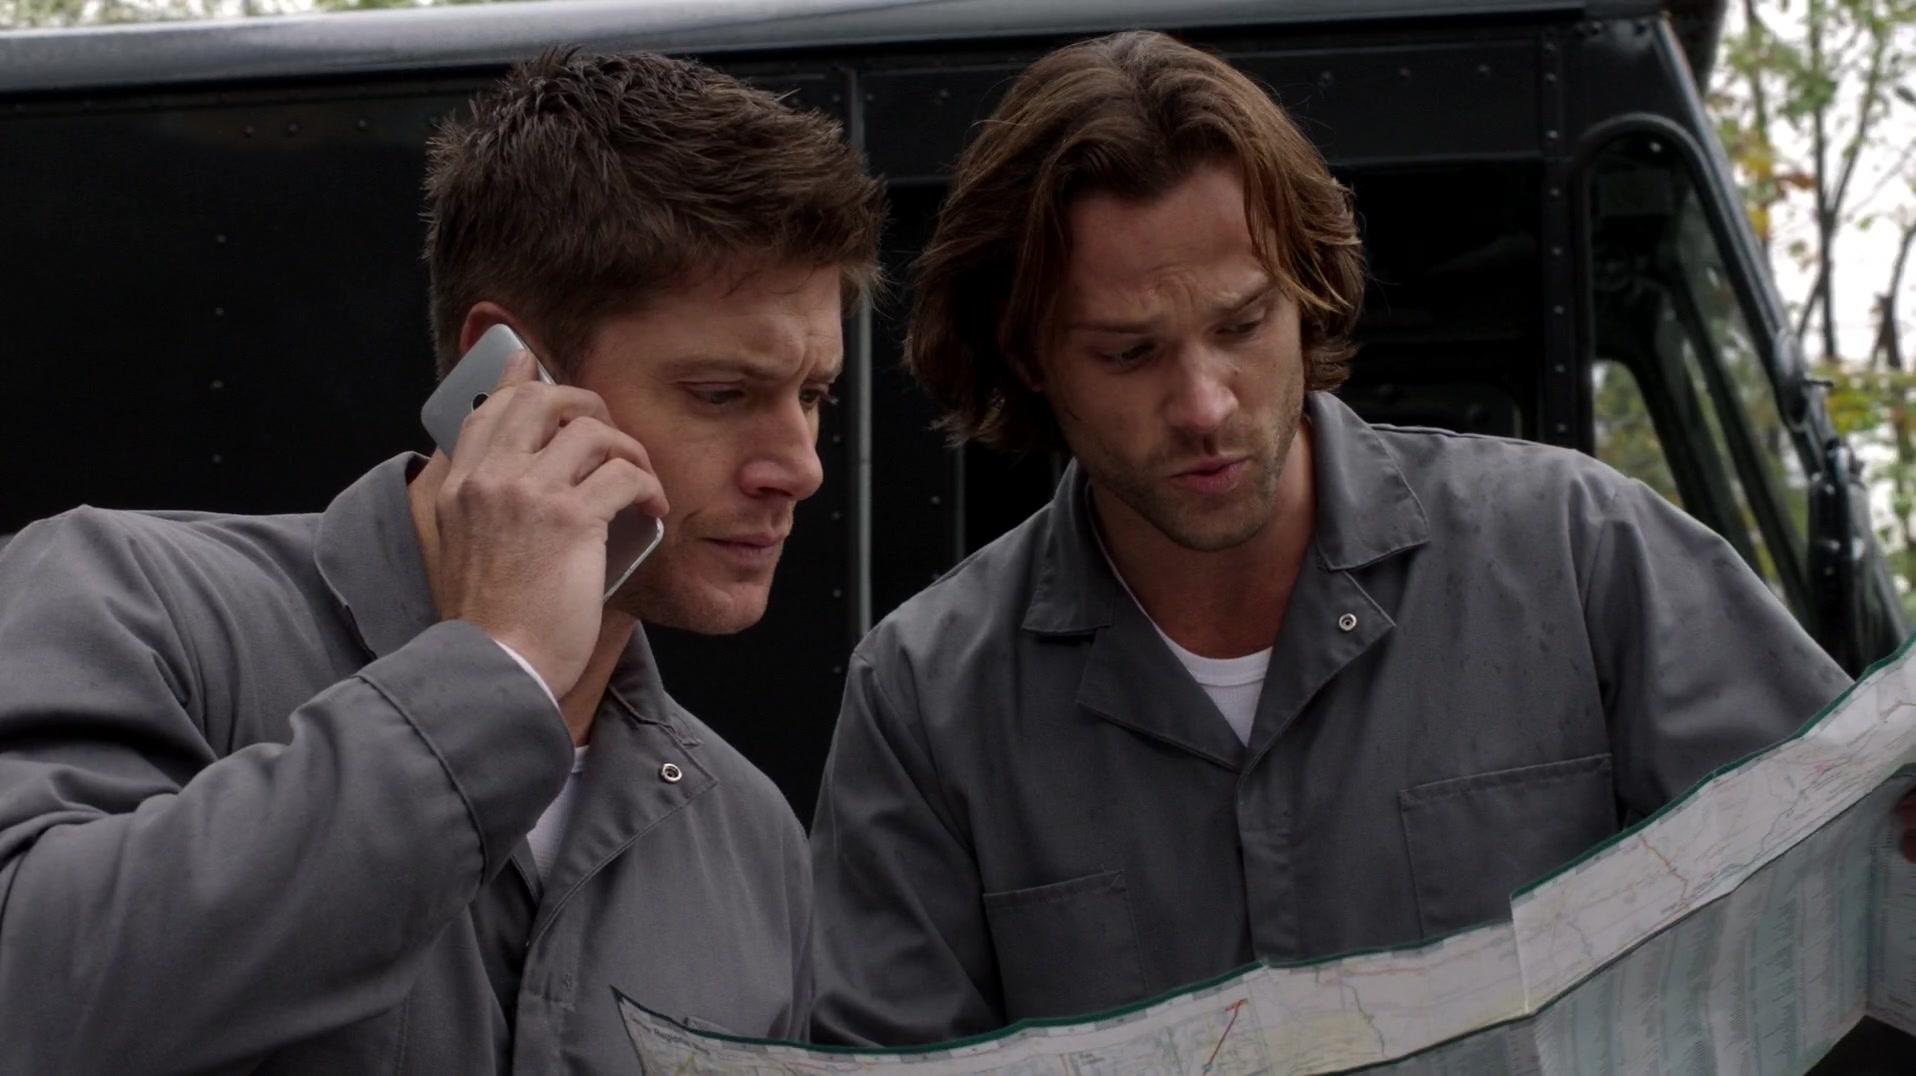 Supernatural.S12E09.1080p.WEB-DL.DD5.1.H264-RARBG 1293.jpg